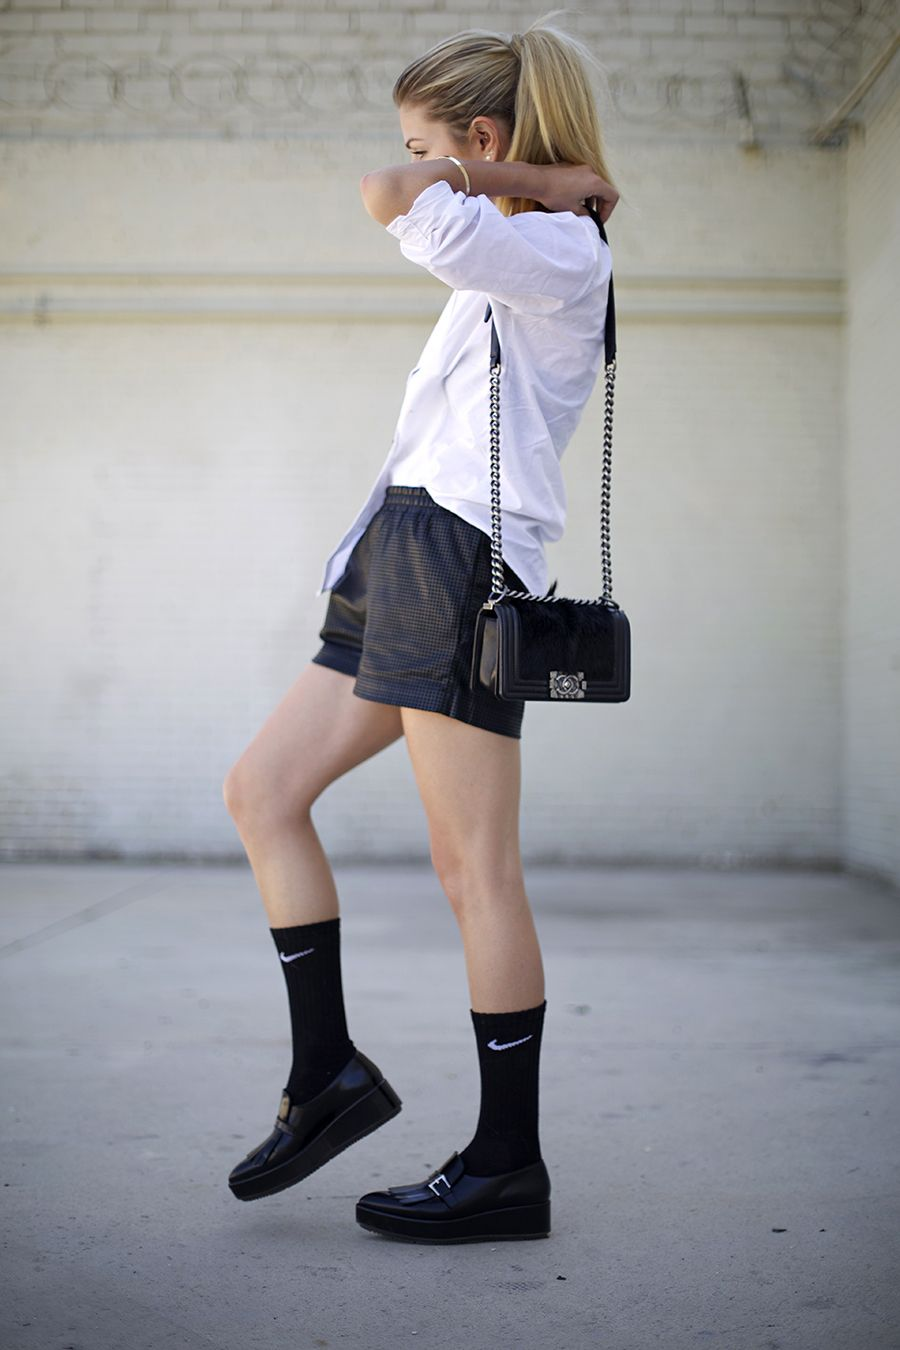 Asian ass attractive capris good mmm shorts sock white